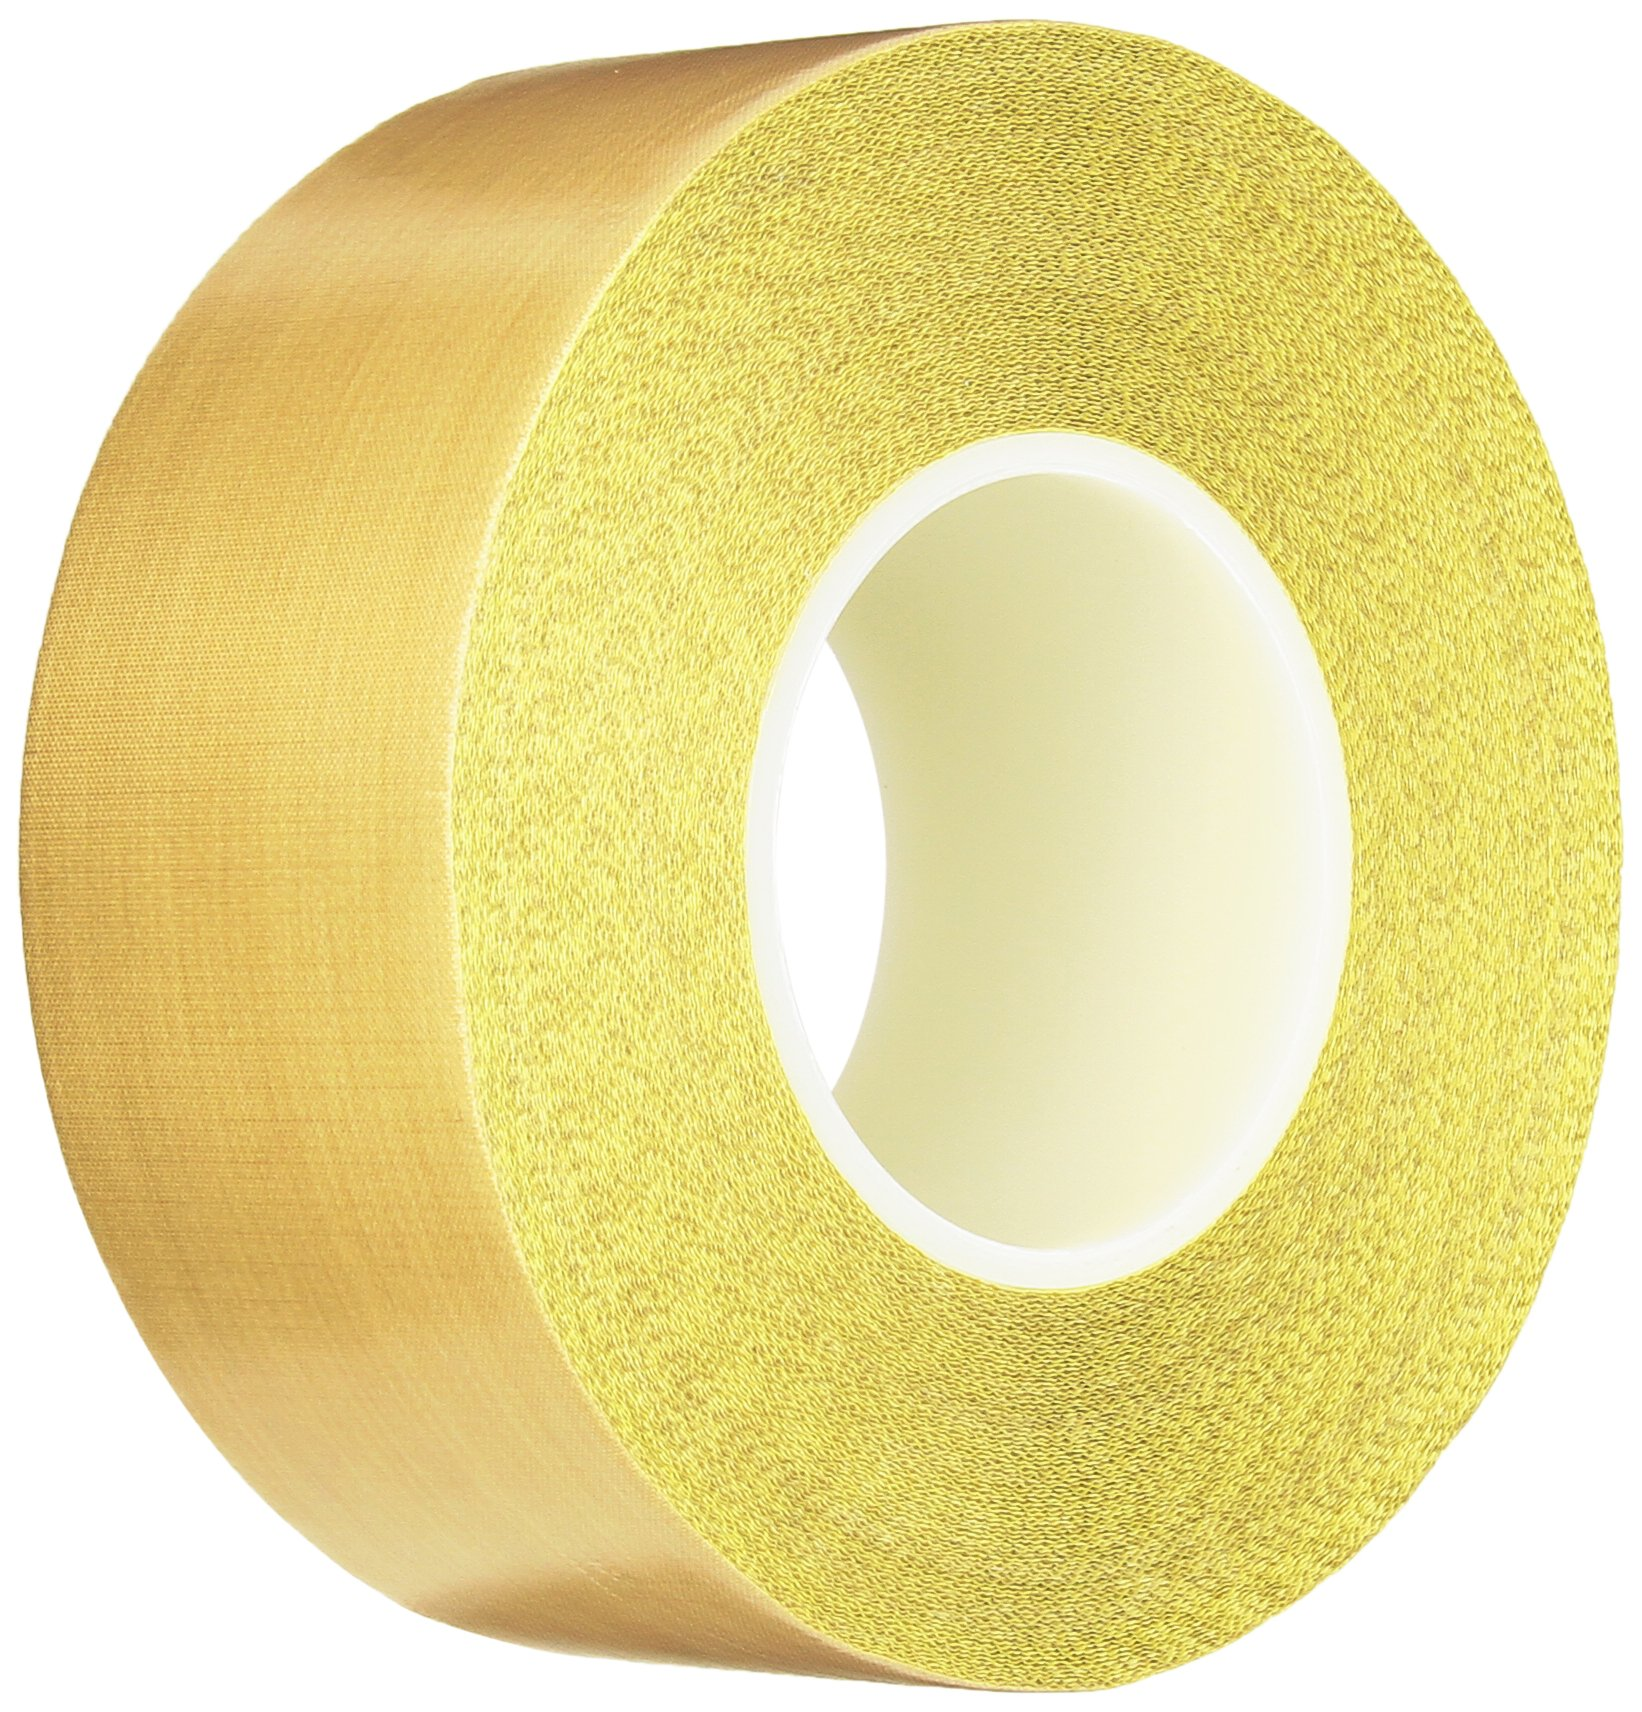 Teflon 21-3S Teflon Coated Tape, Silicone Adhesive, 2.5'' x 36 Yards